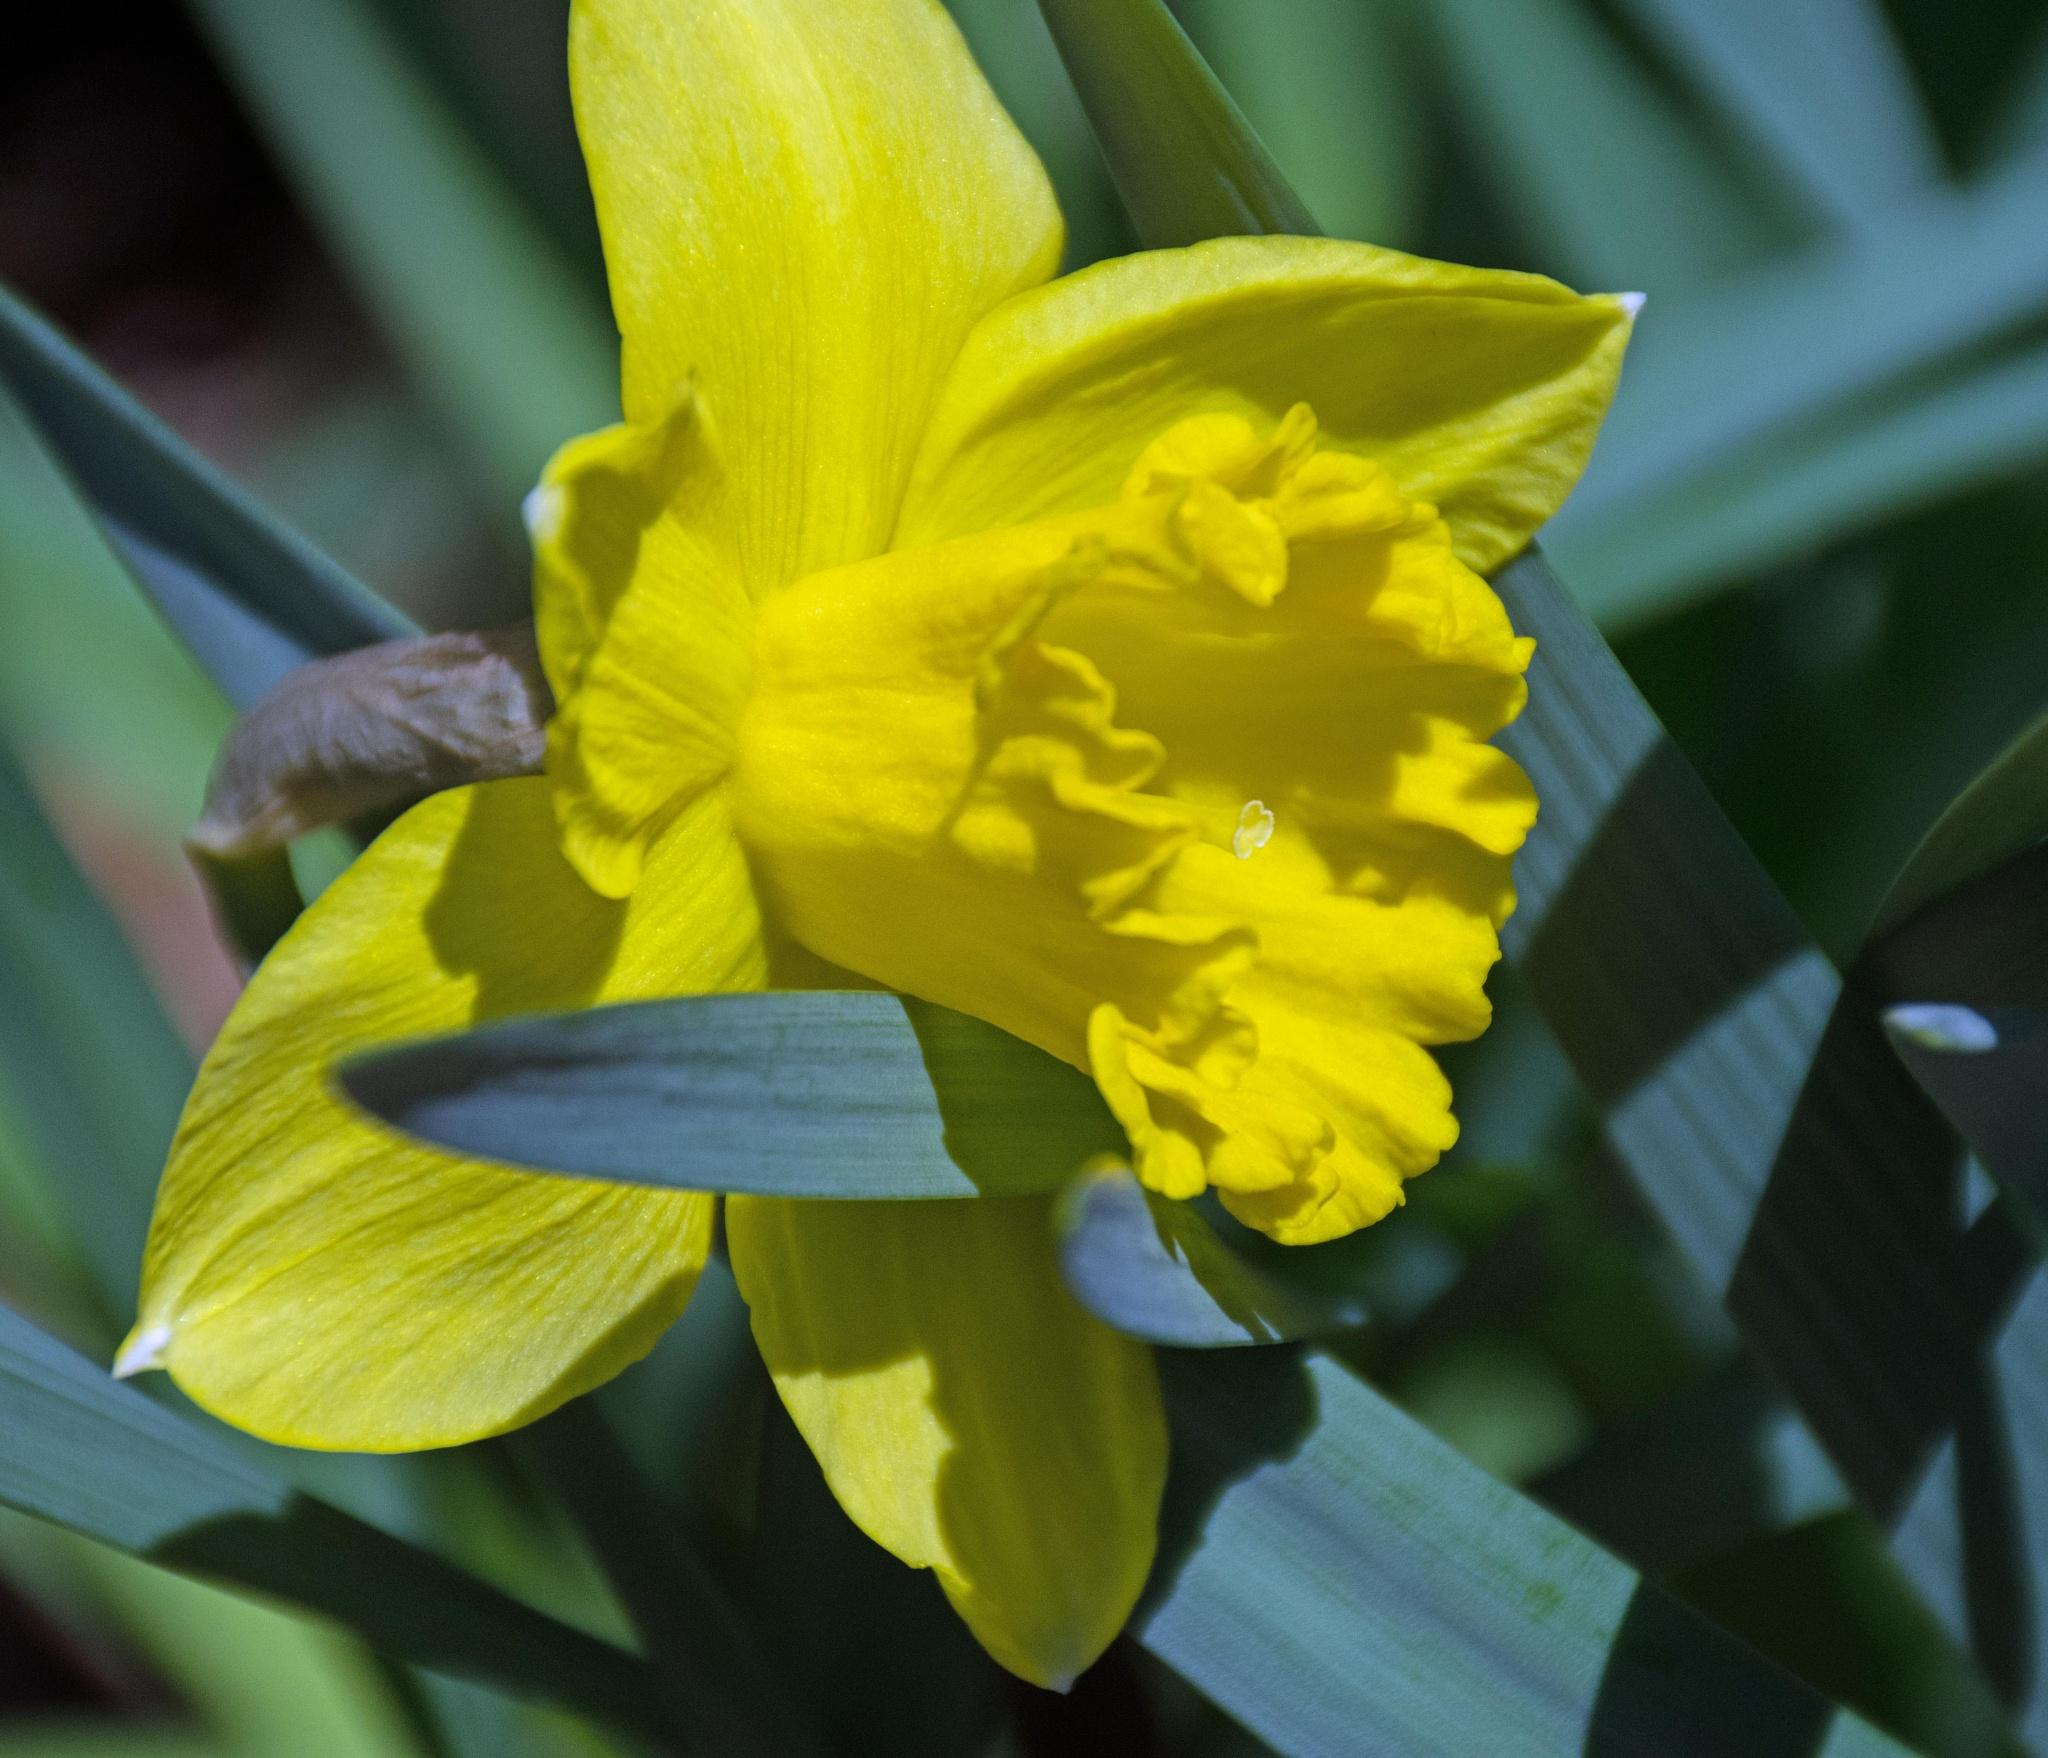 Spring 2 by Brady Williams